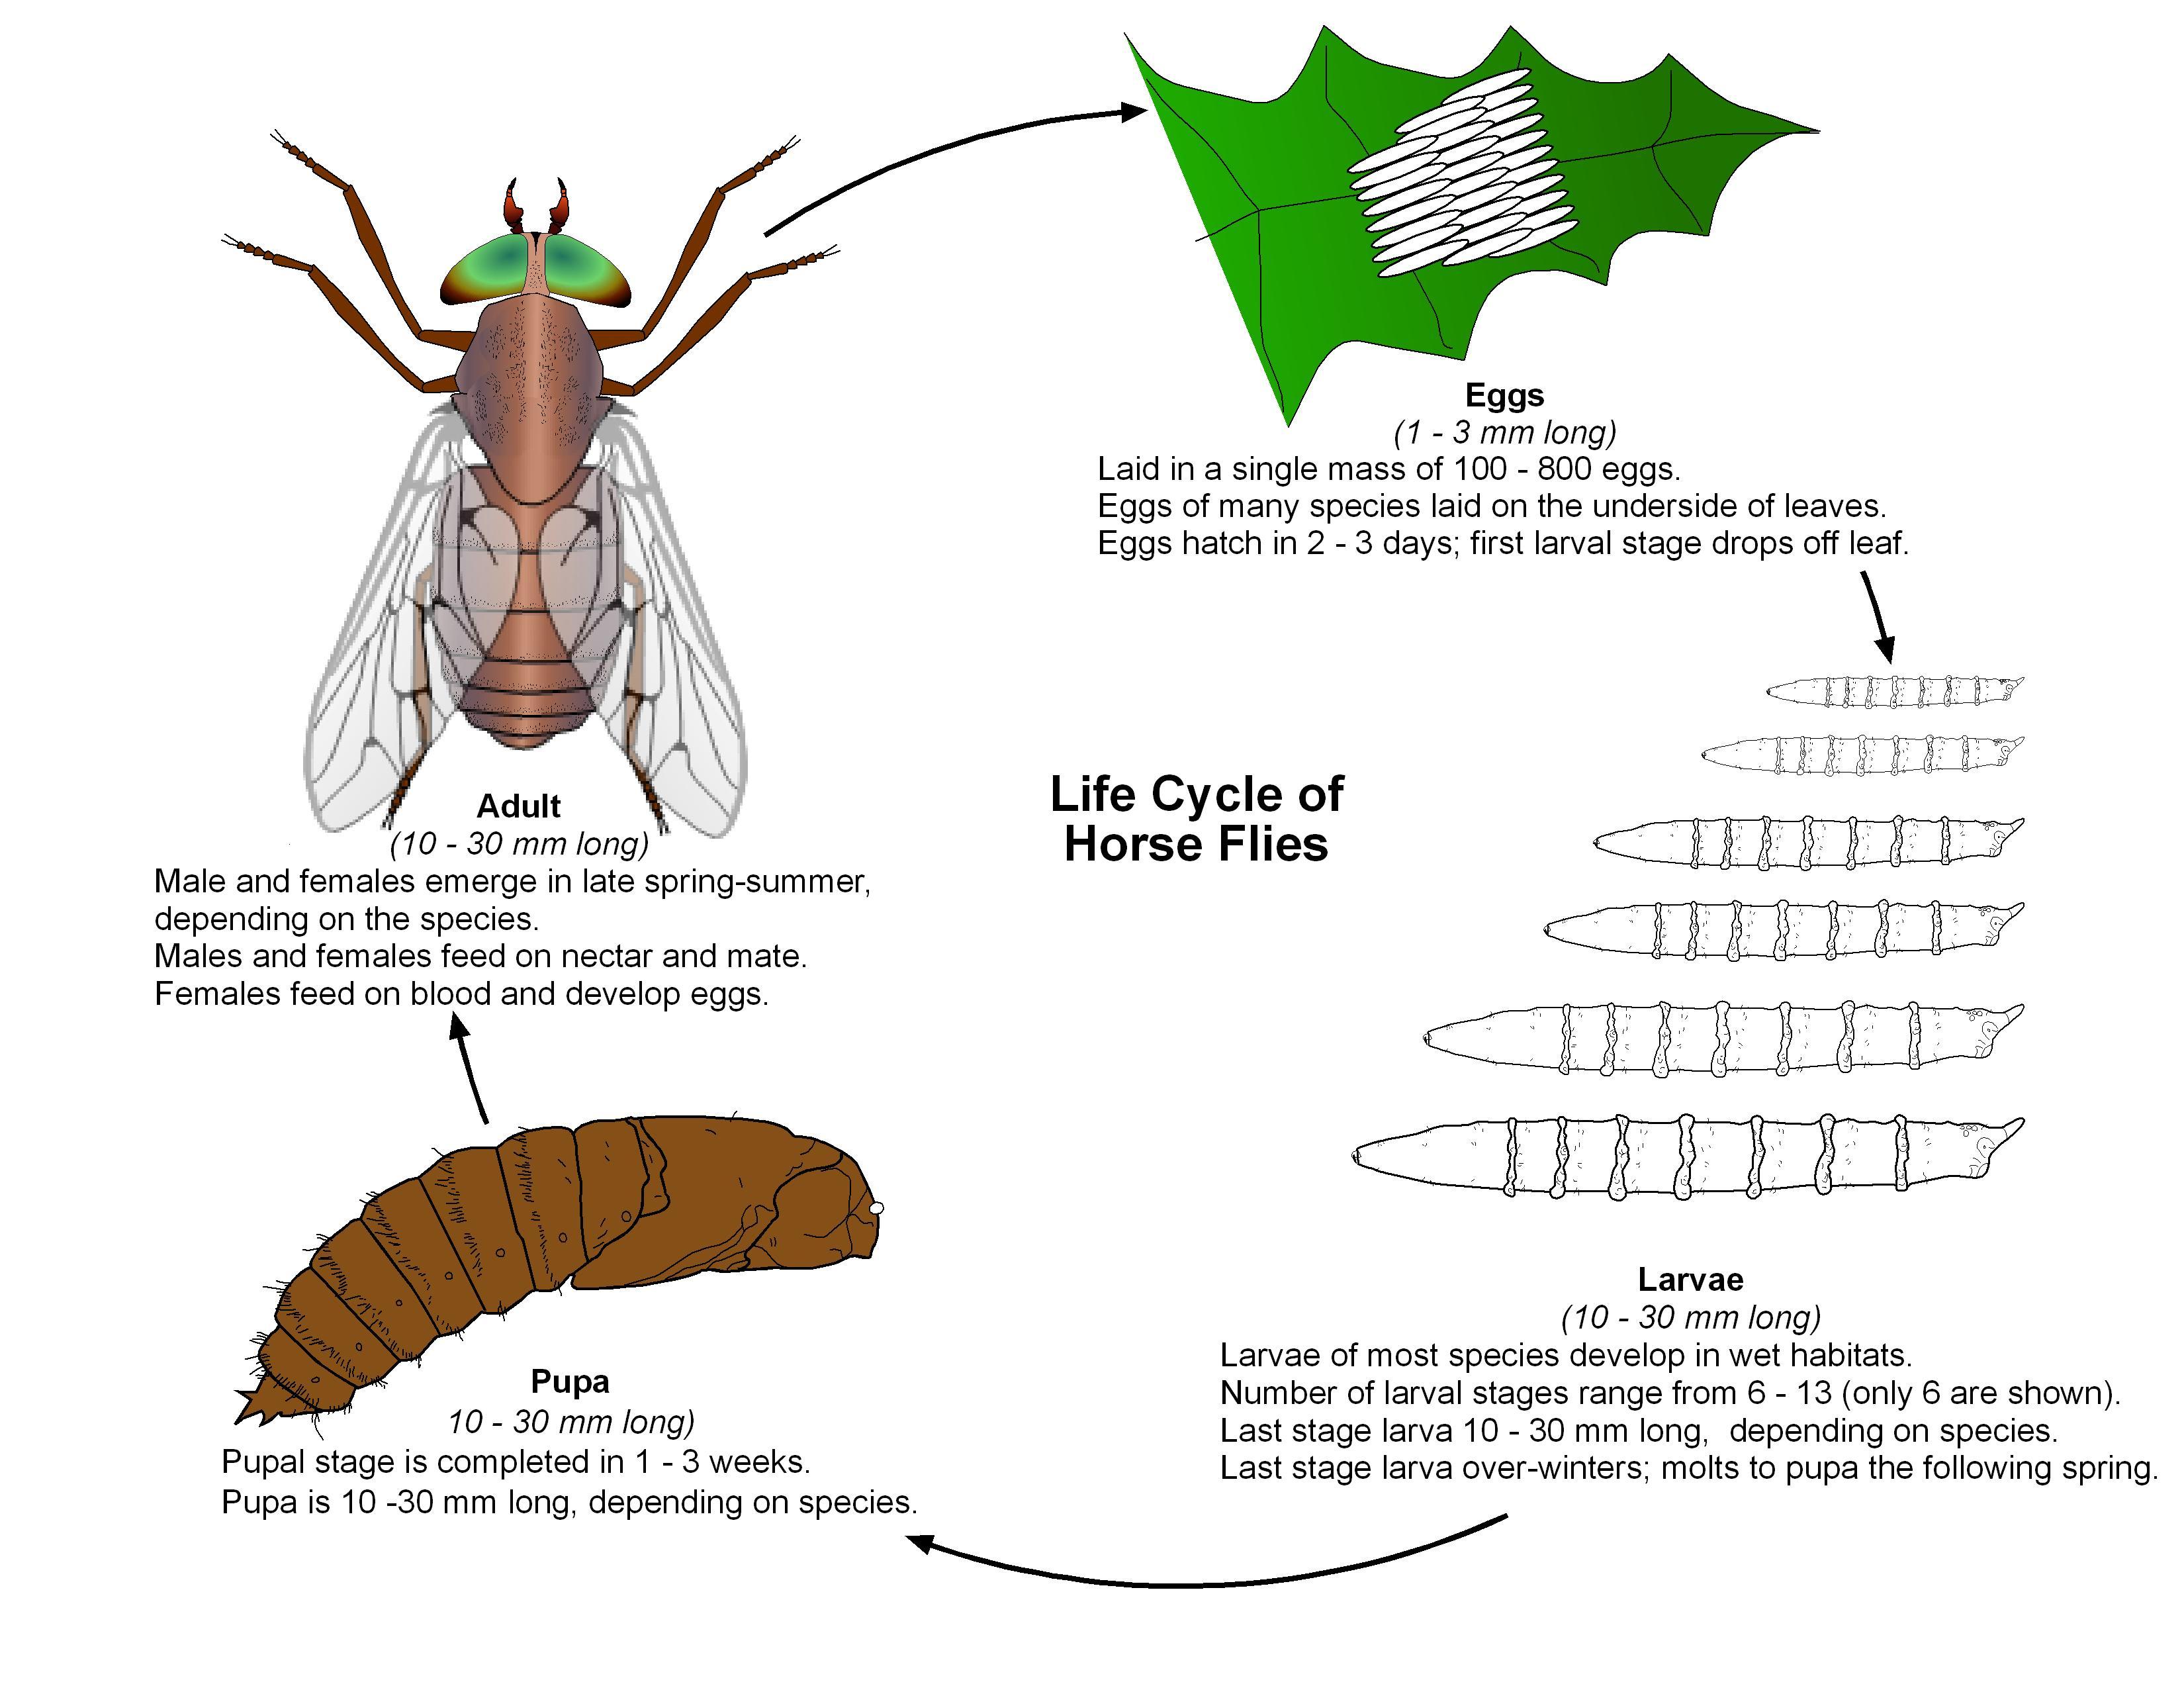 Resources | Public Health and Medical Entomology | Purdue ... - photo#10